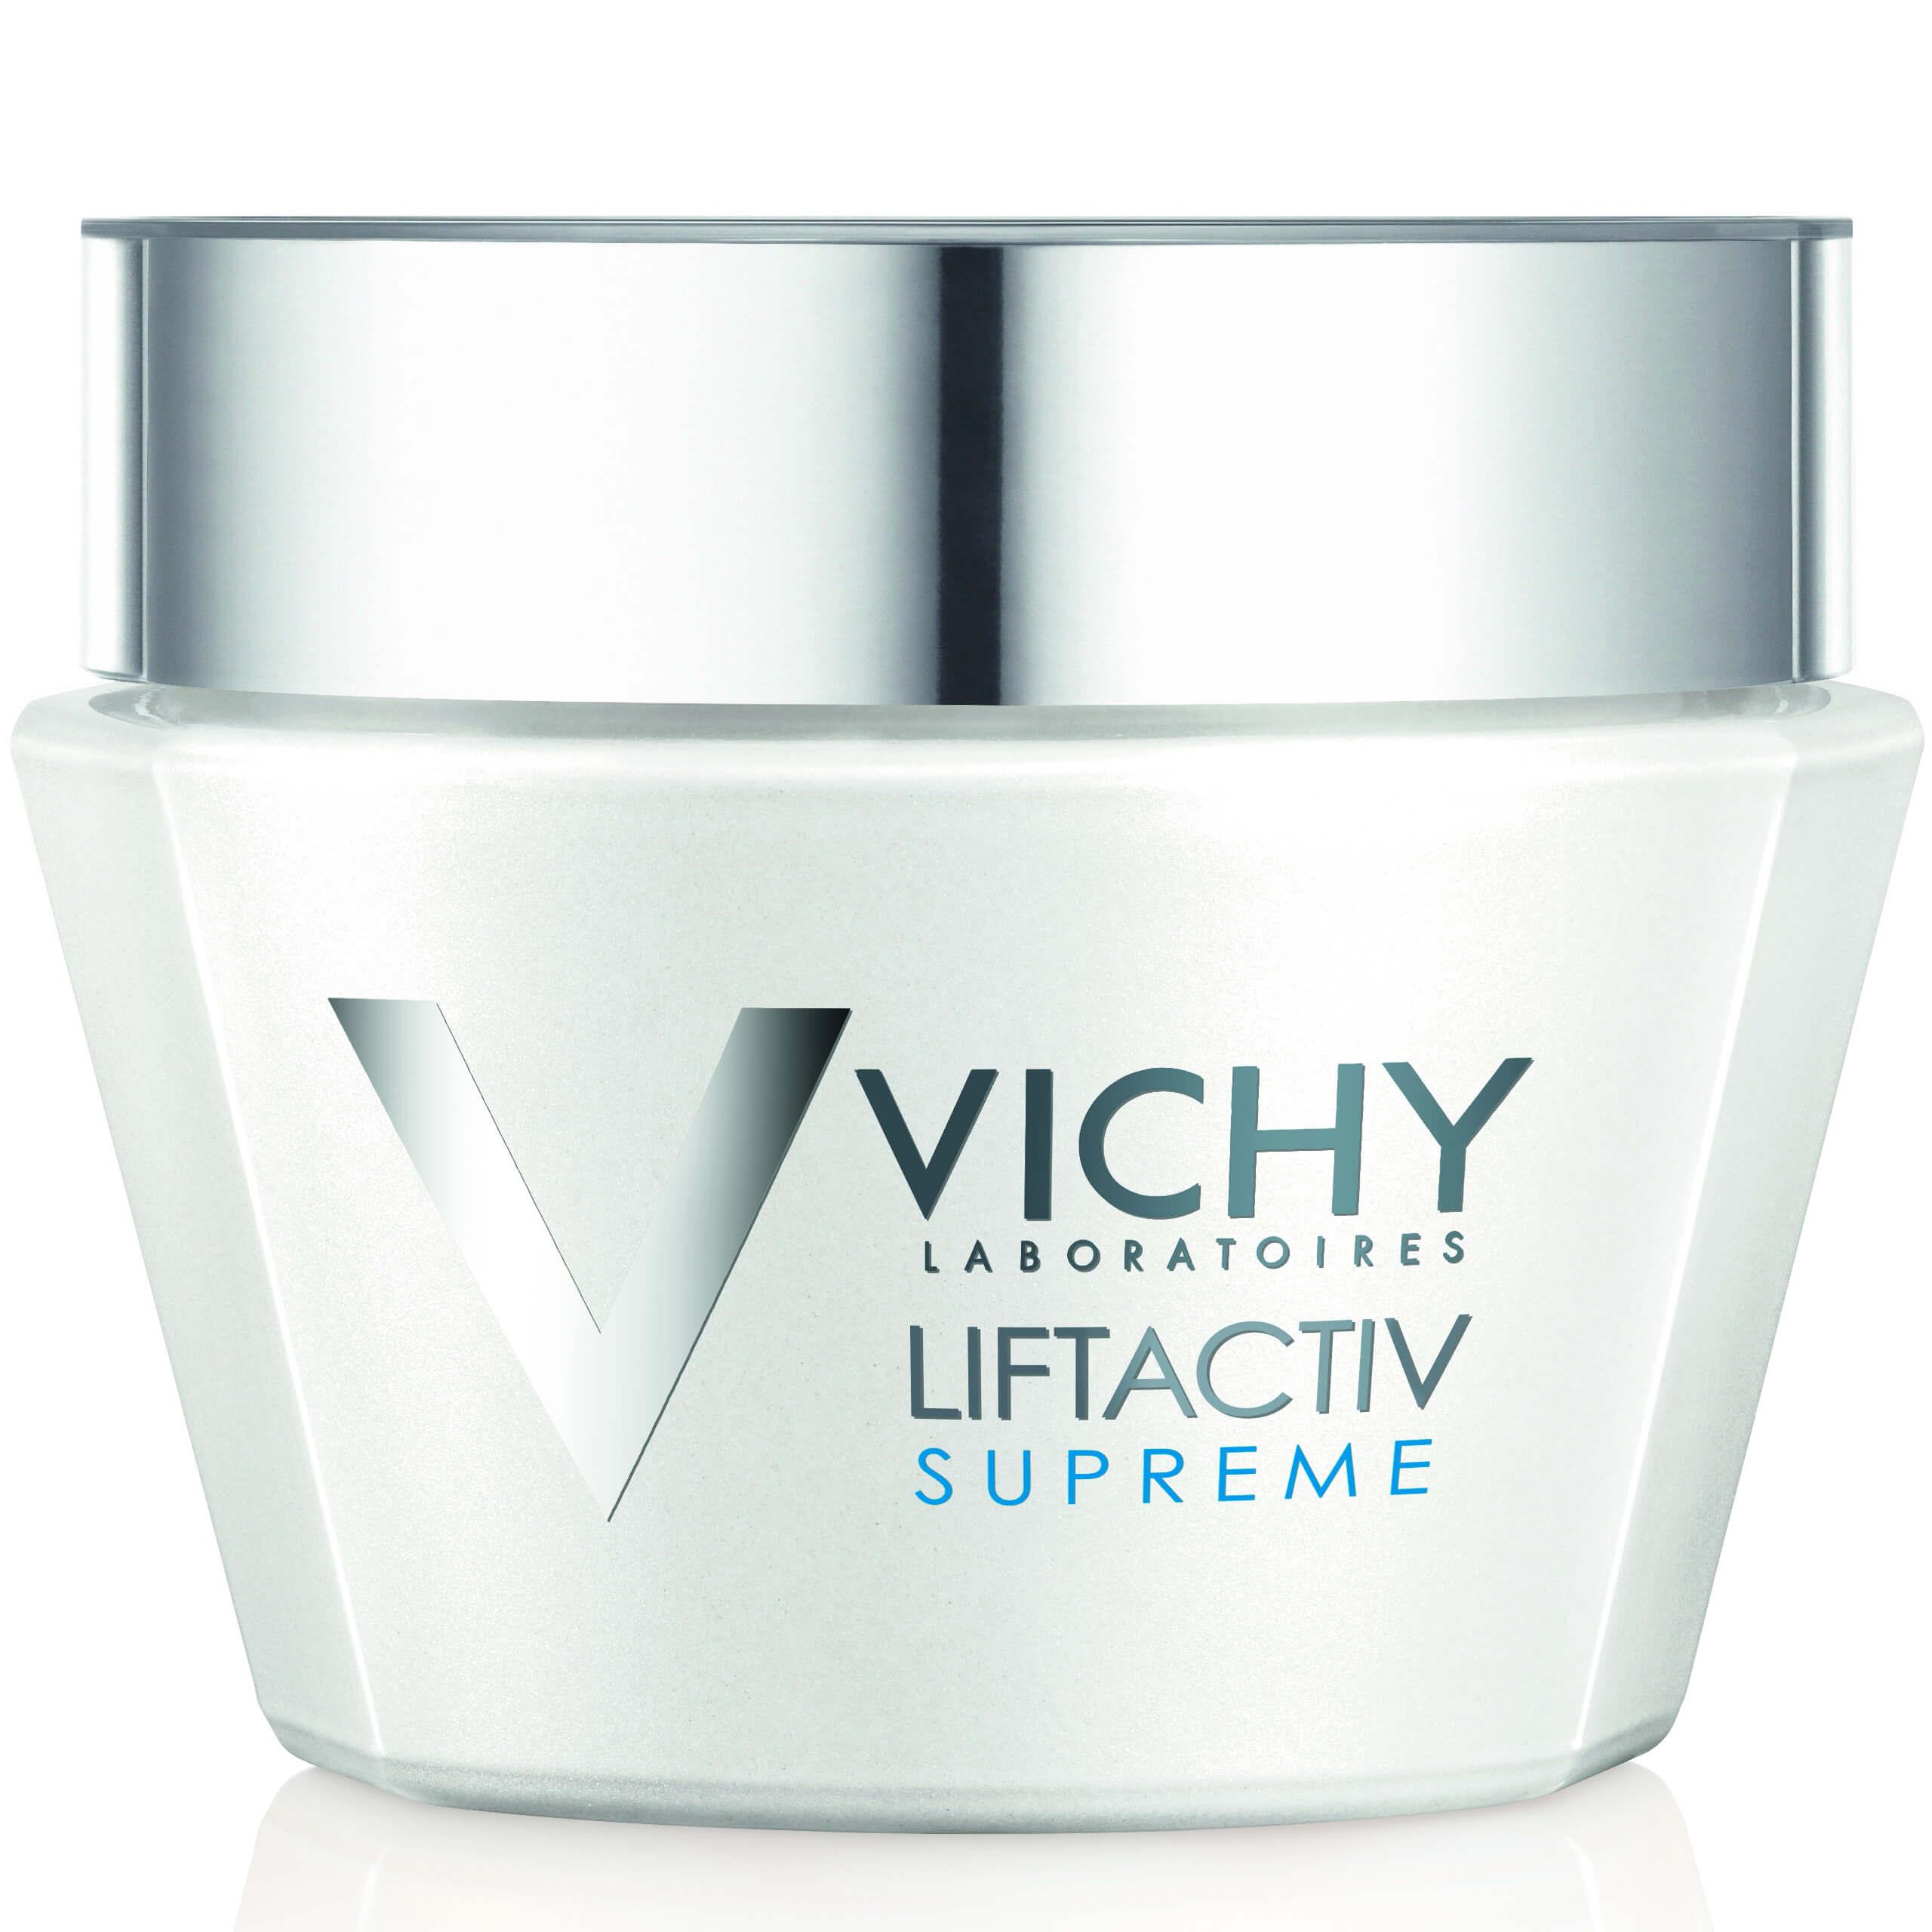 Vichy Liftactiv Supreme Αντιρυτιδική & Συσφικτική Κρέμα Προσώπου Ξηρή / Πολύ Ξηρή Επιδερμίδα 50ml